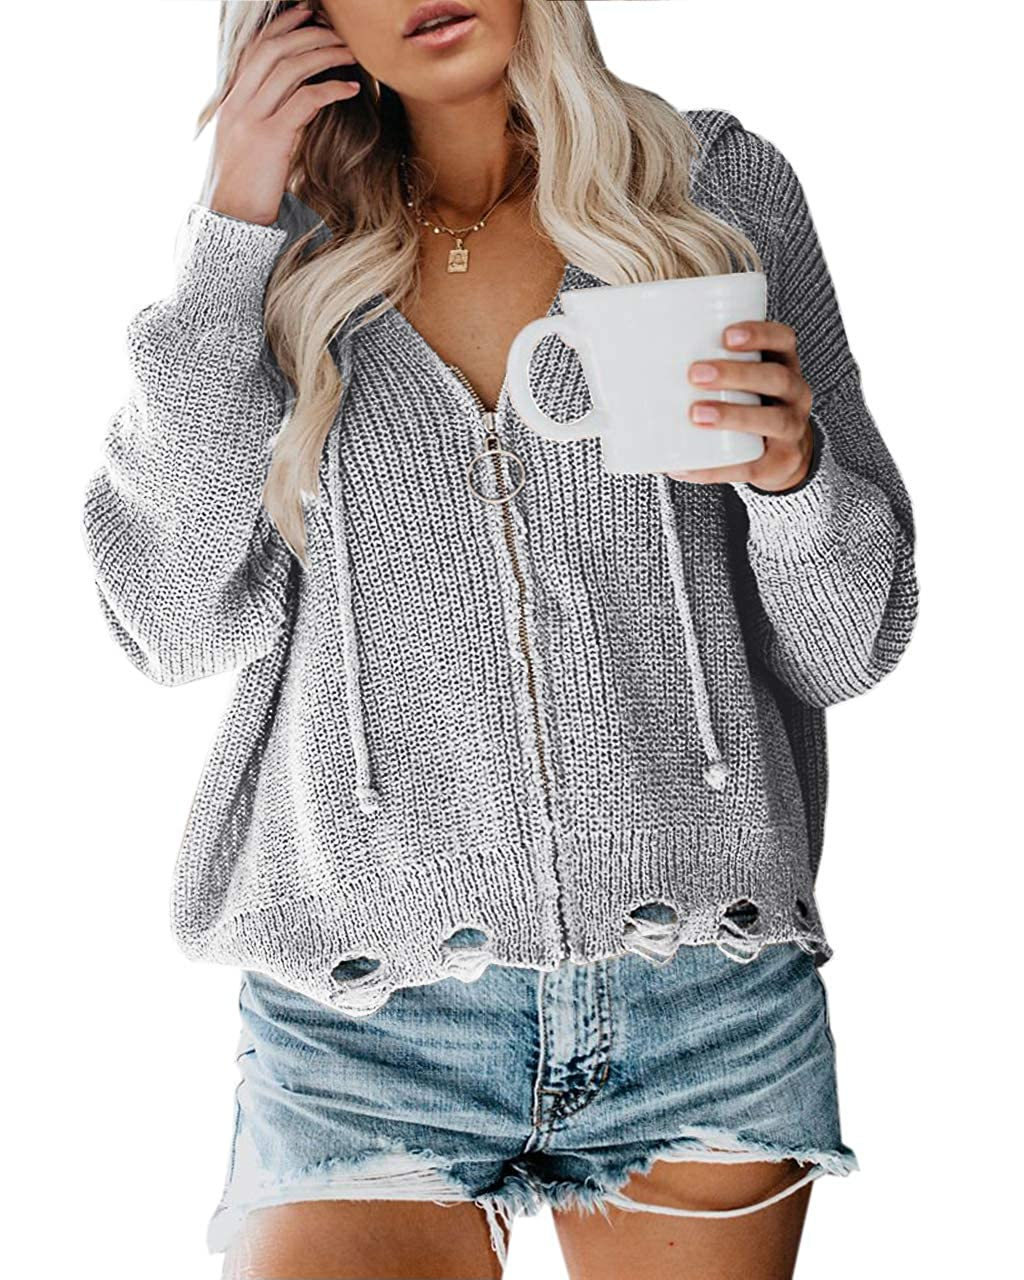 Yskkt Womens Plus Size Hoodies Sweatshirt Zip Up Drawstring Loose Knit Fall Sweaters Pullover